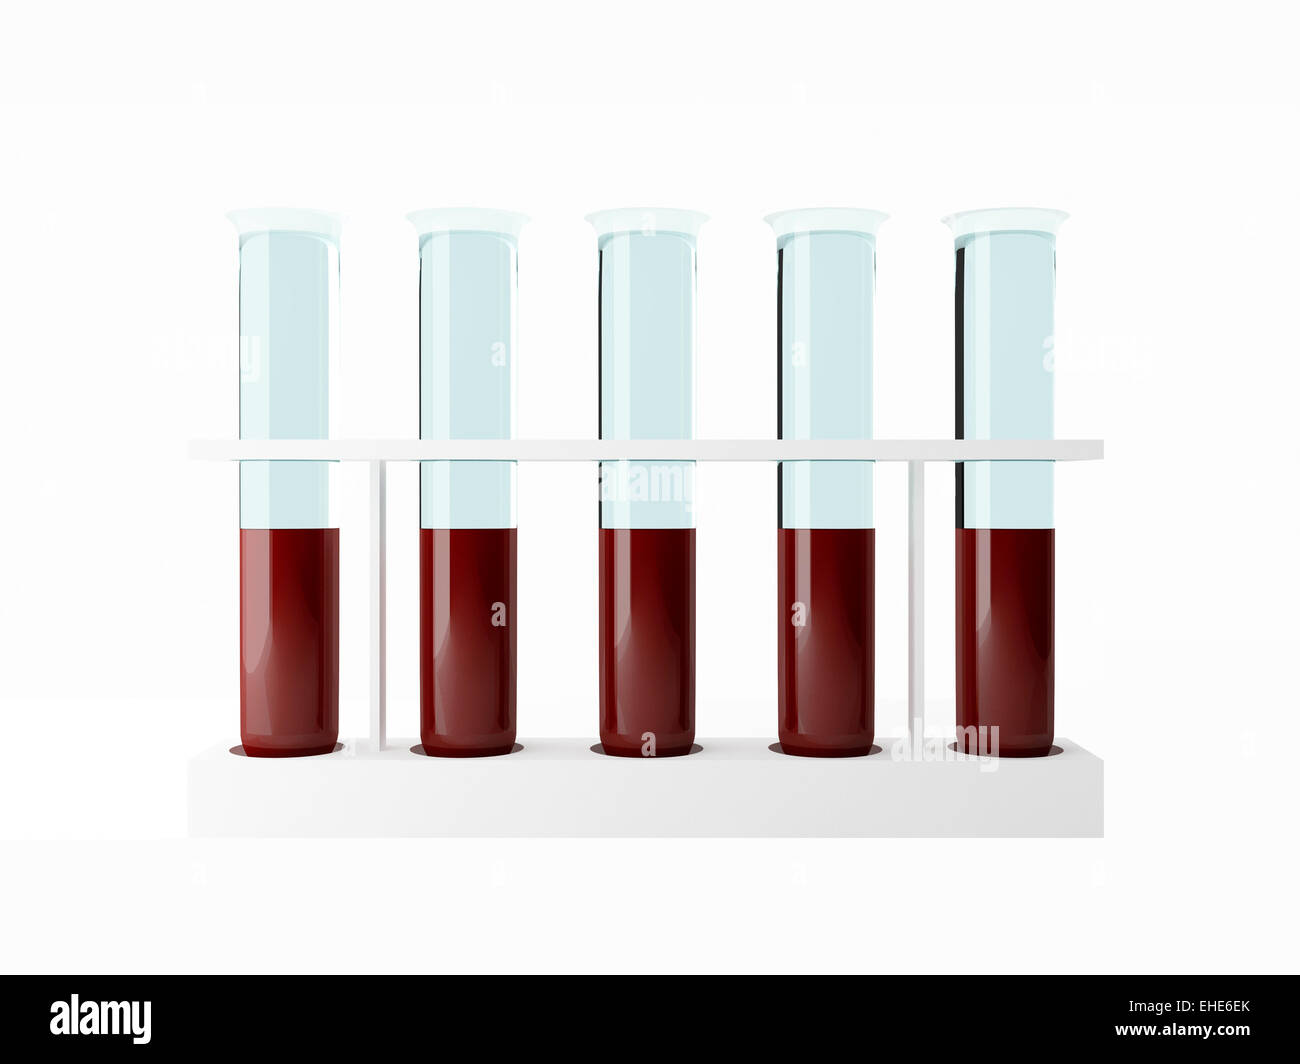 Blood Test tube - Stock Image